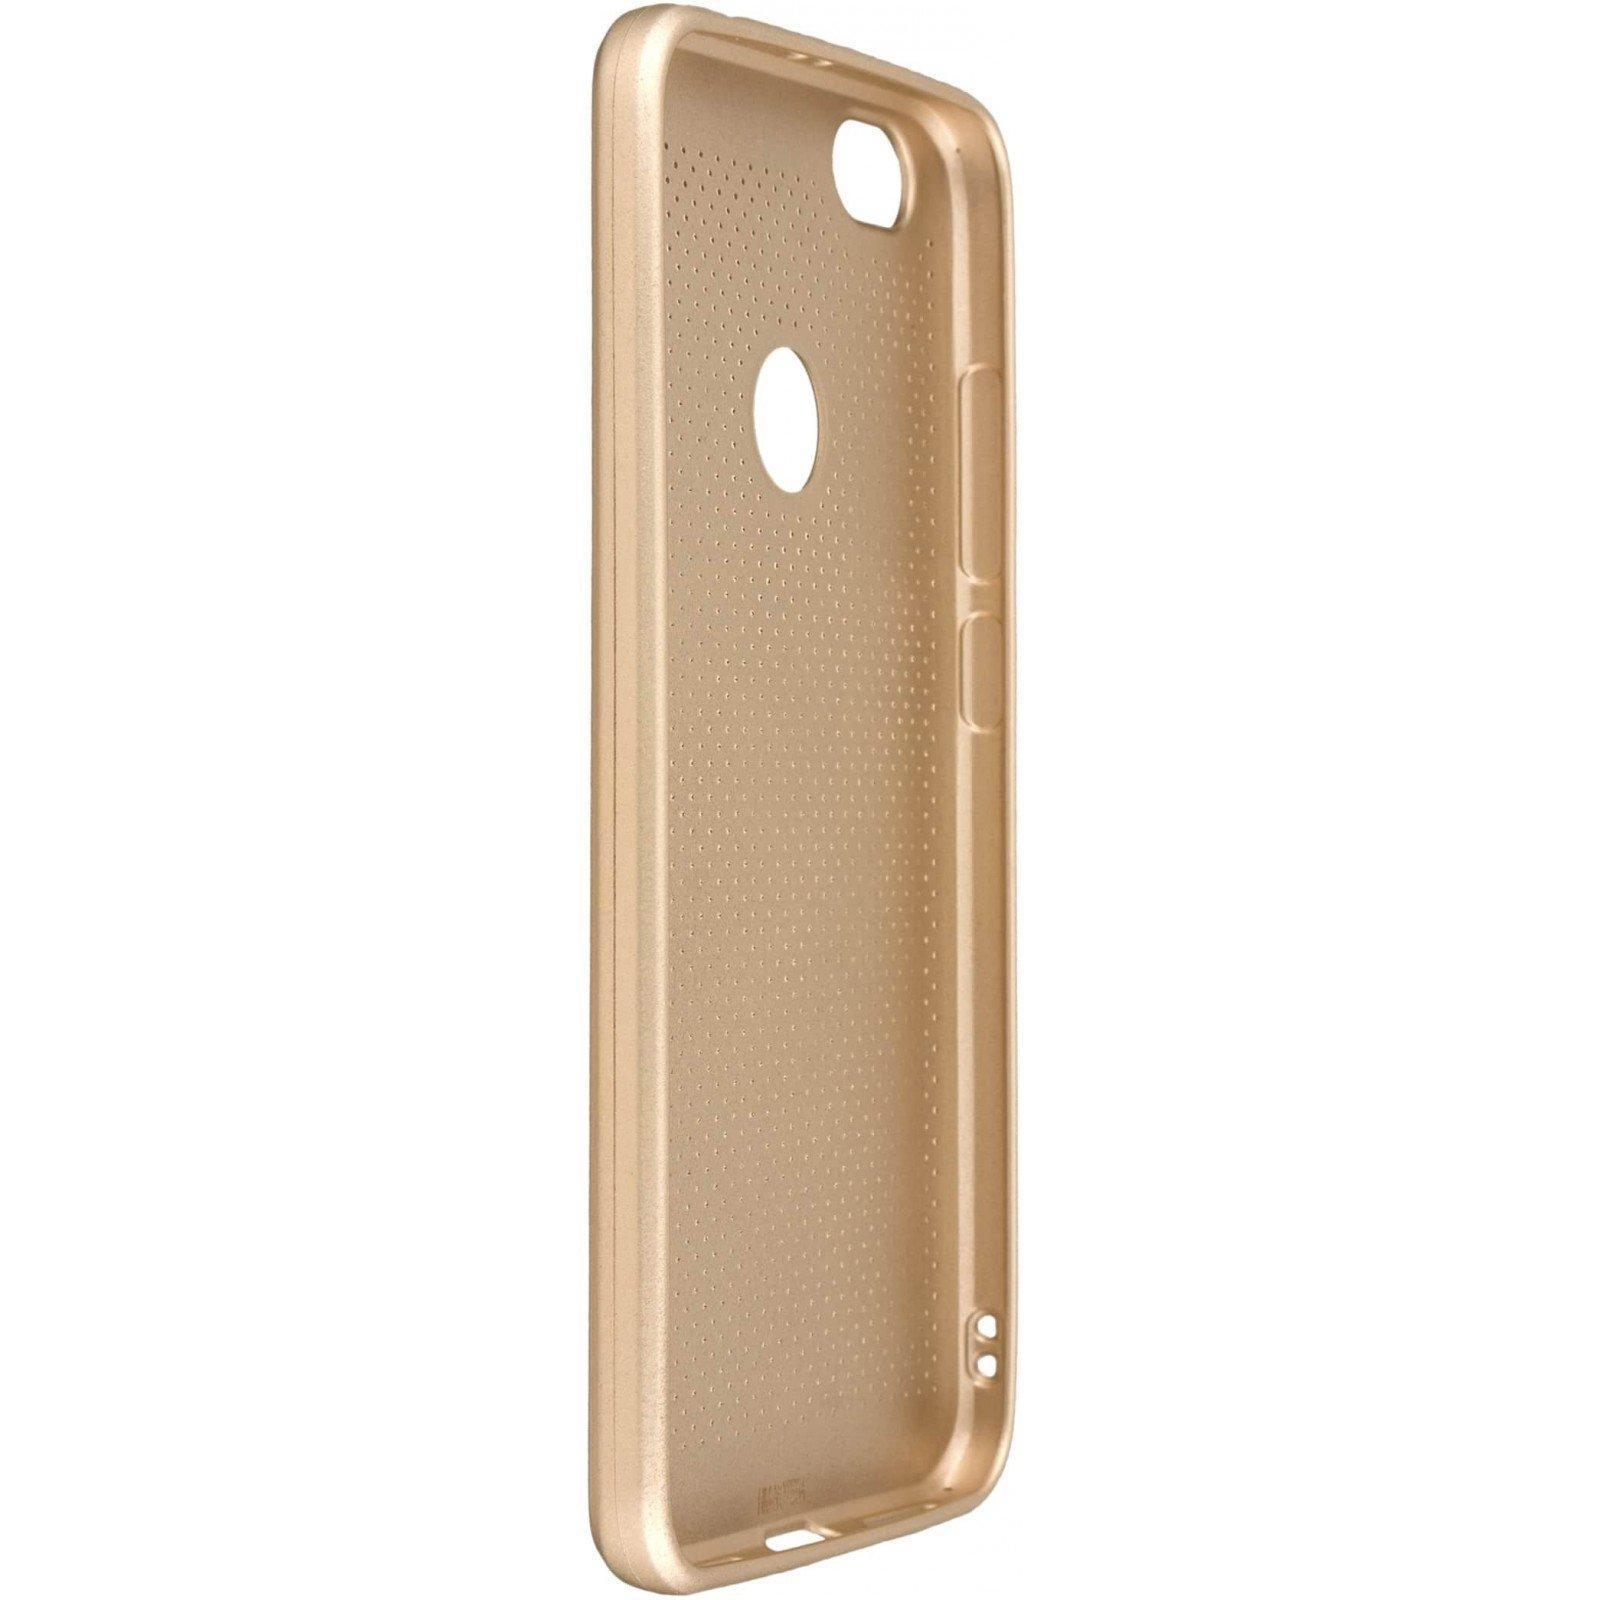 Чехол для моб. телефона MakeFuture TPU/Moon Case для Xiaomi Redmi Note 5A Prime Gold (MCM-XRN5APGD) изображение 6